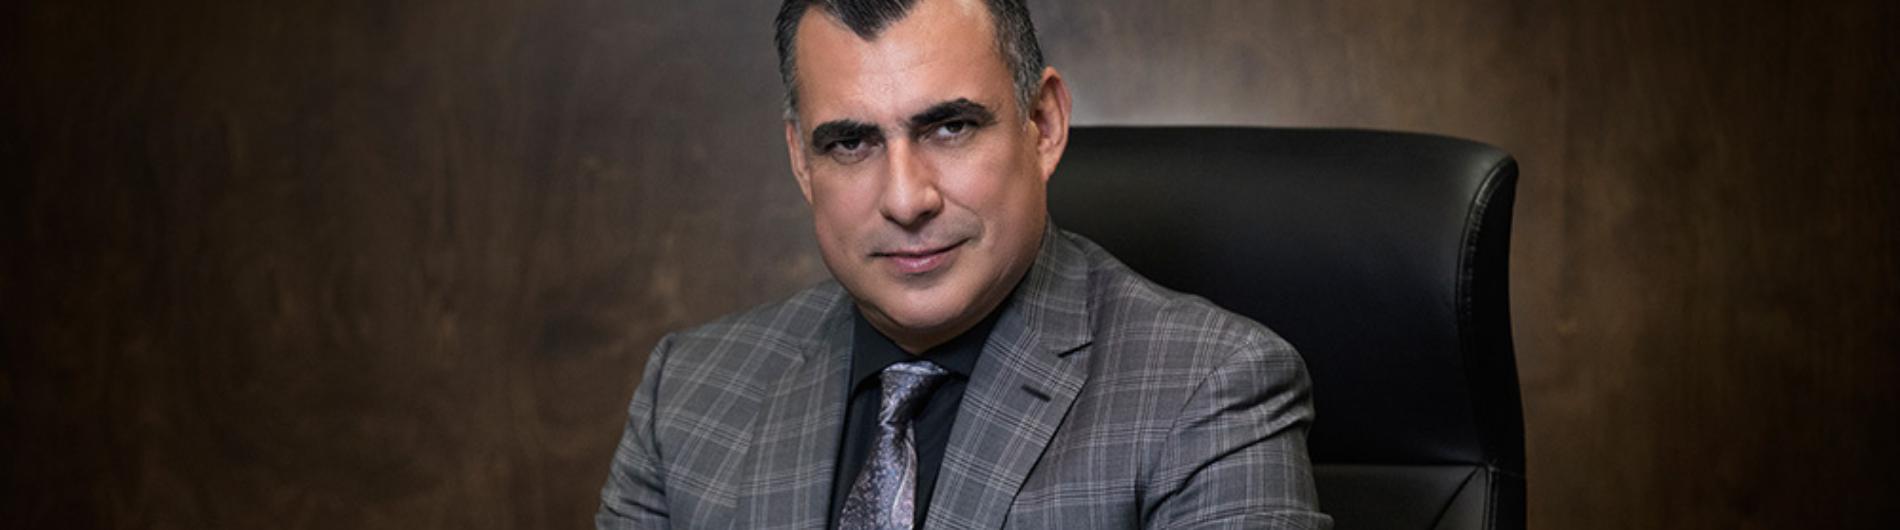 Jorge Ojeda, Director de Grupo Aries